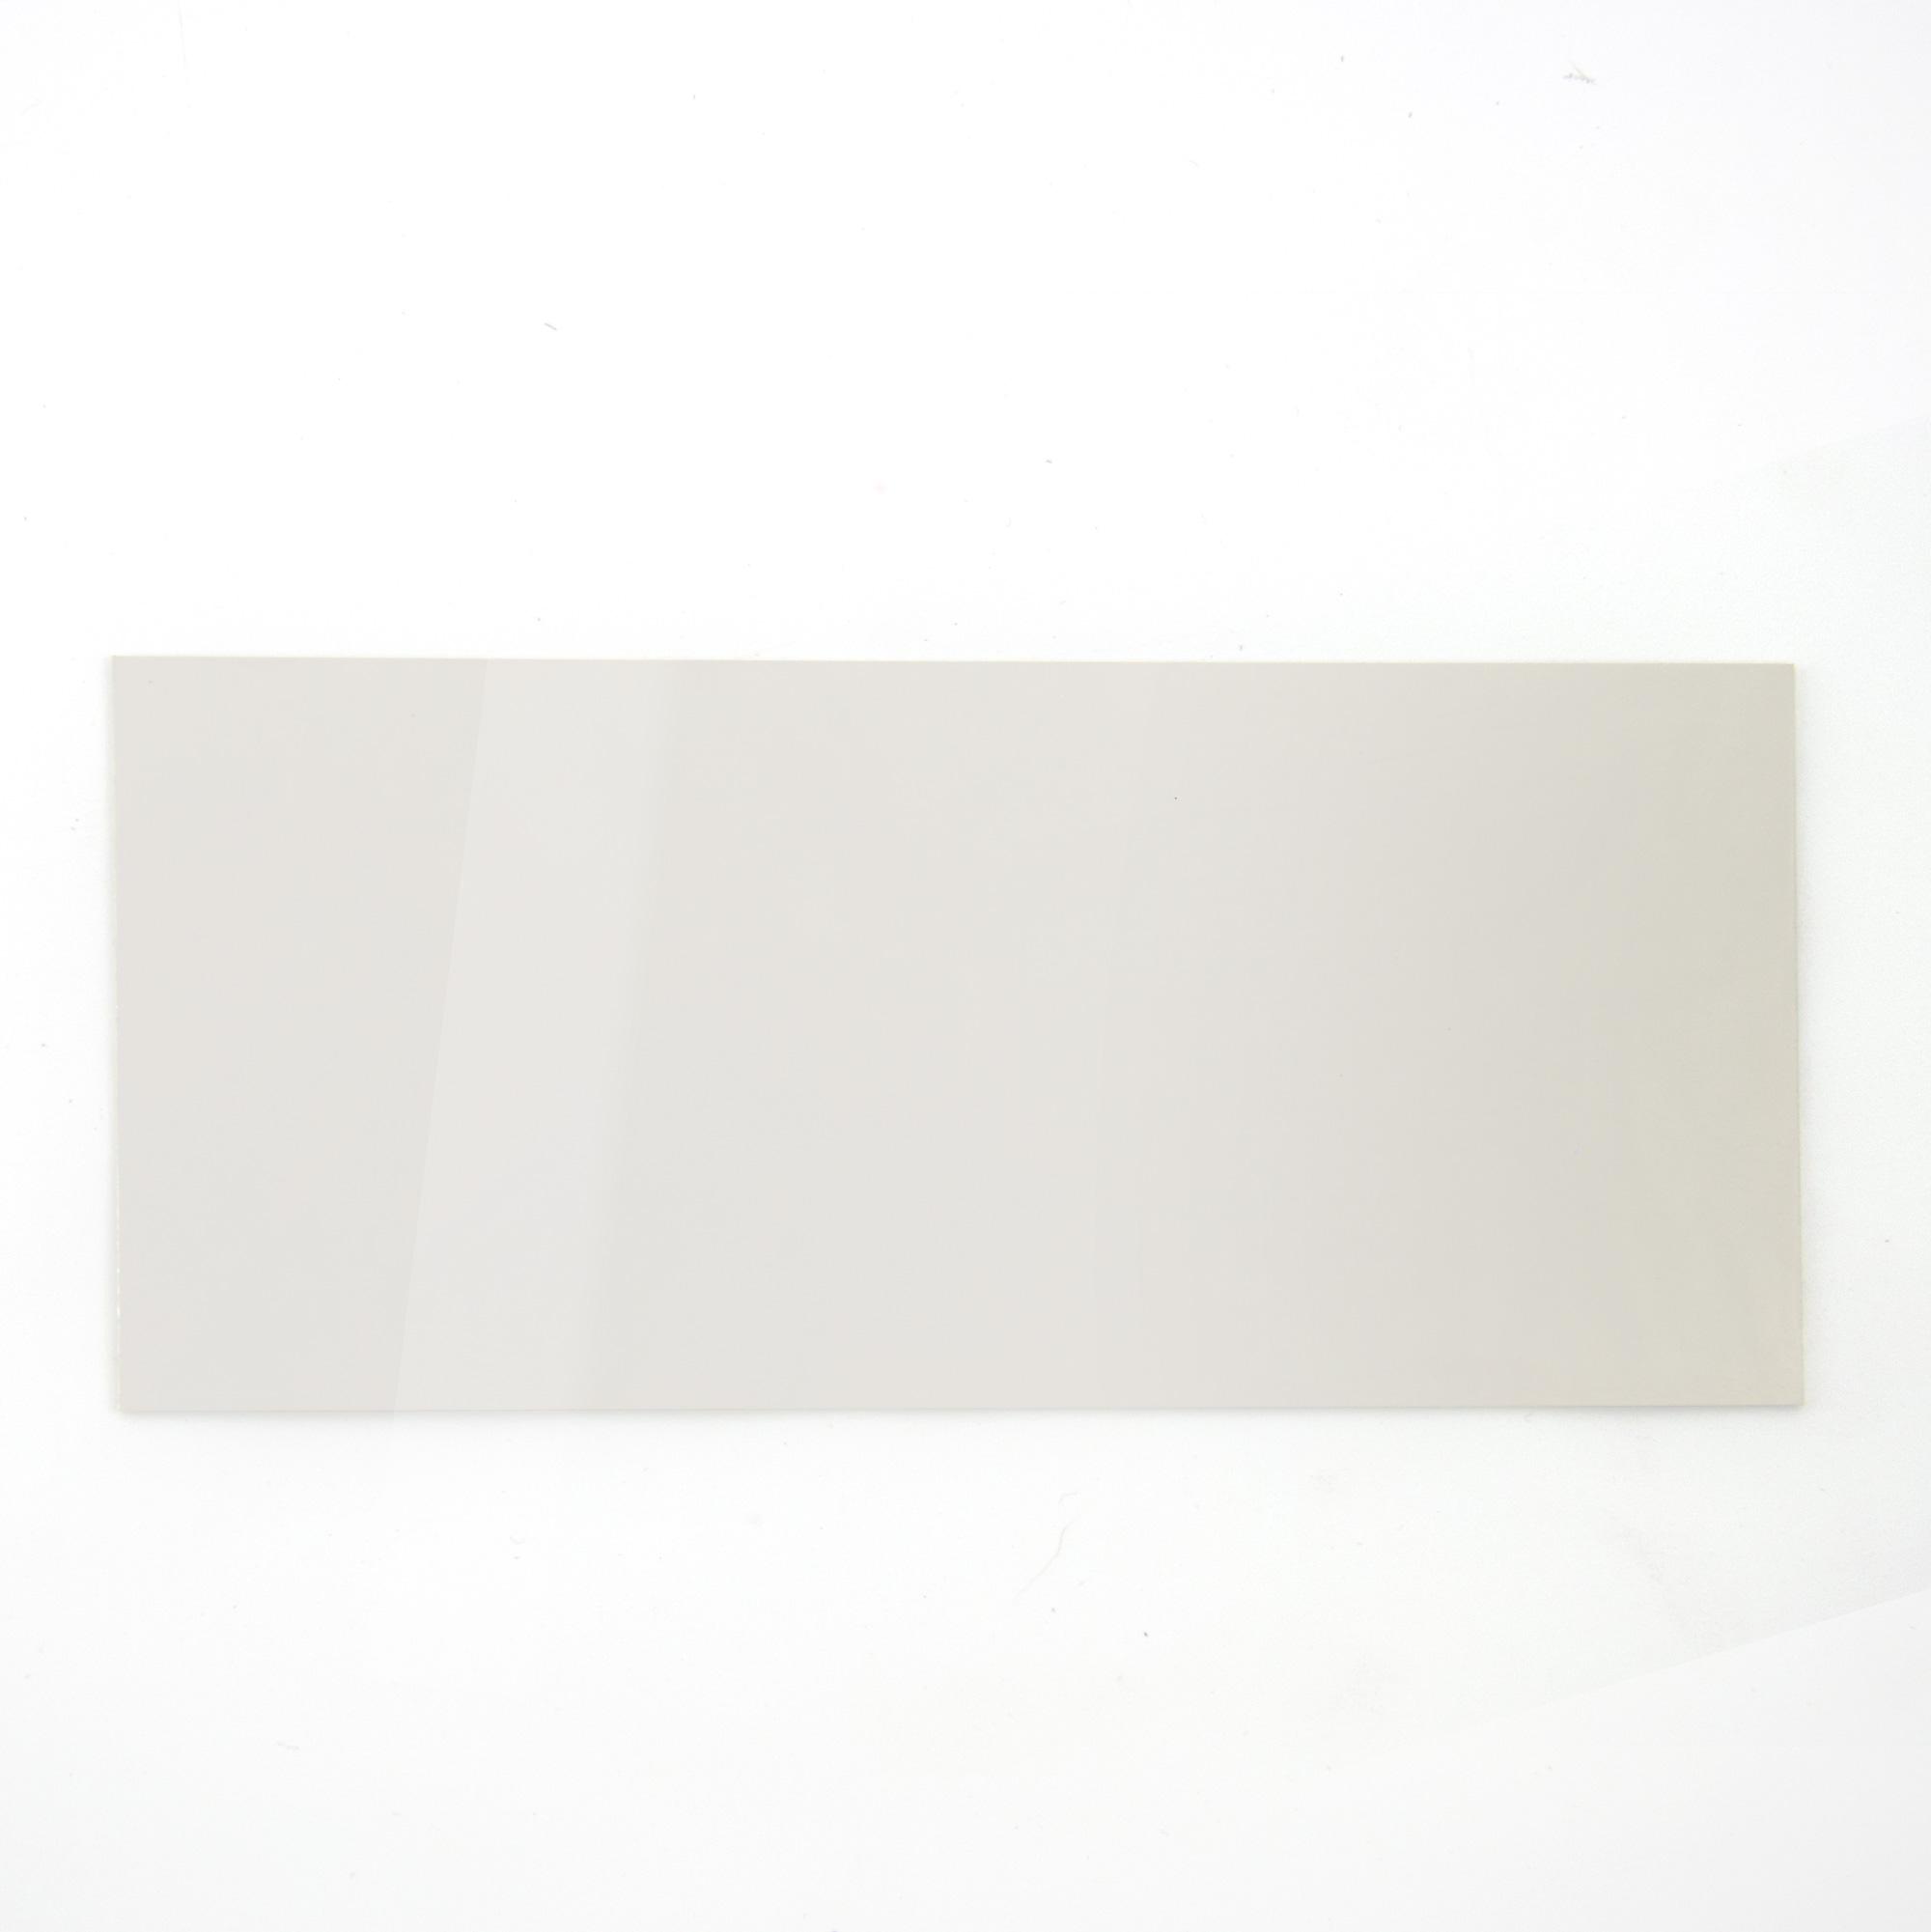 Acciaio inox finitura specchio - campione